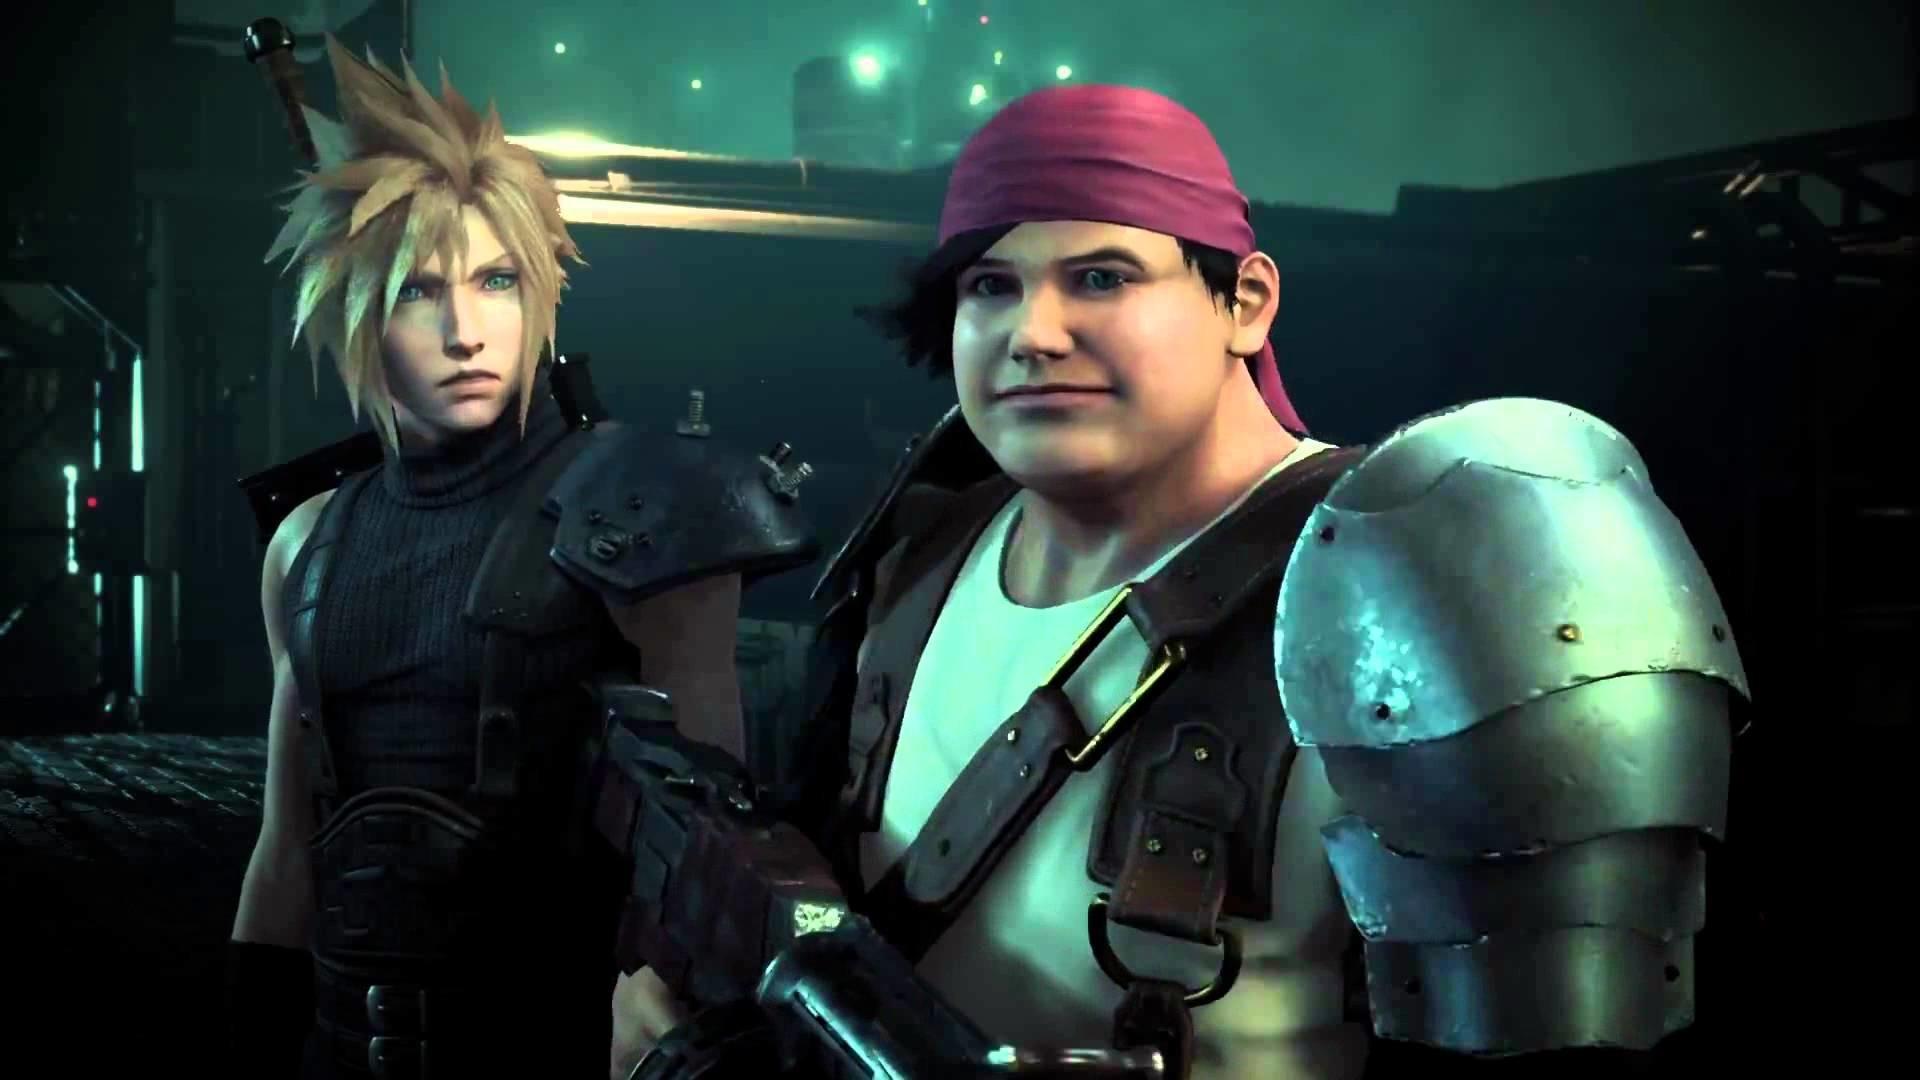 Final Fantasy VII Remake – PS4 Gameplay Trailer – (1080p HD!)